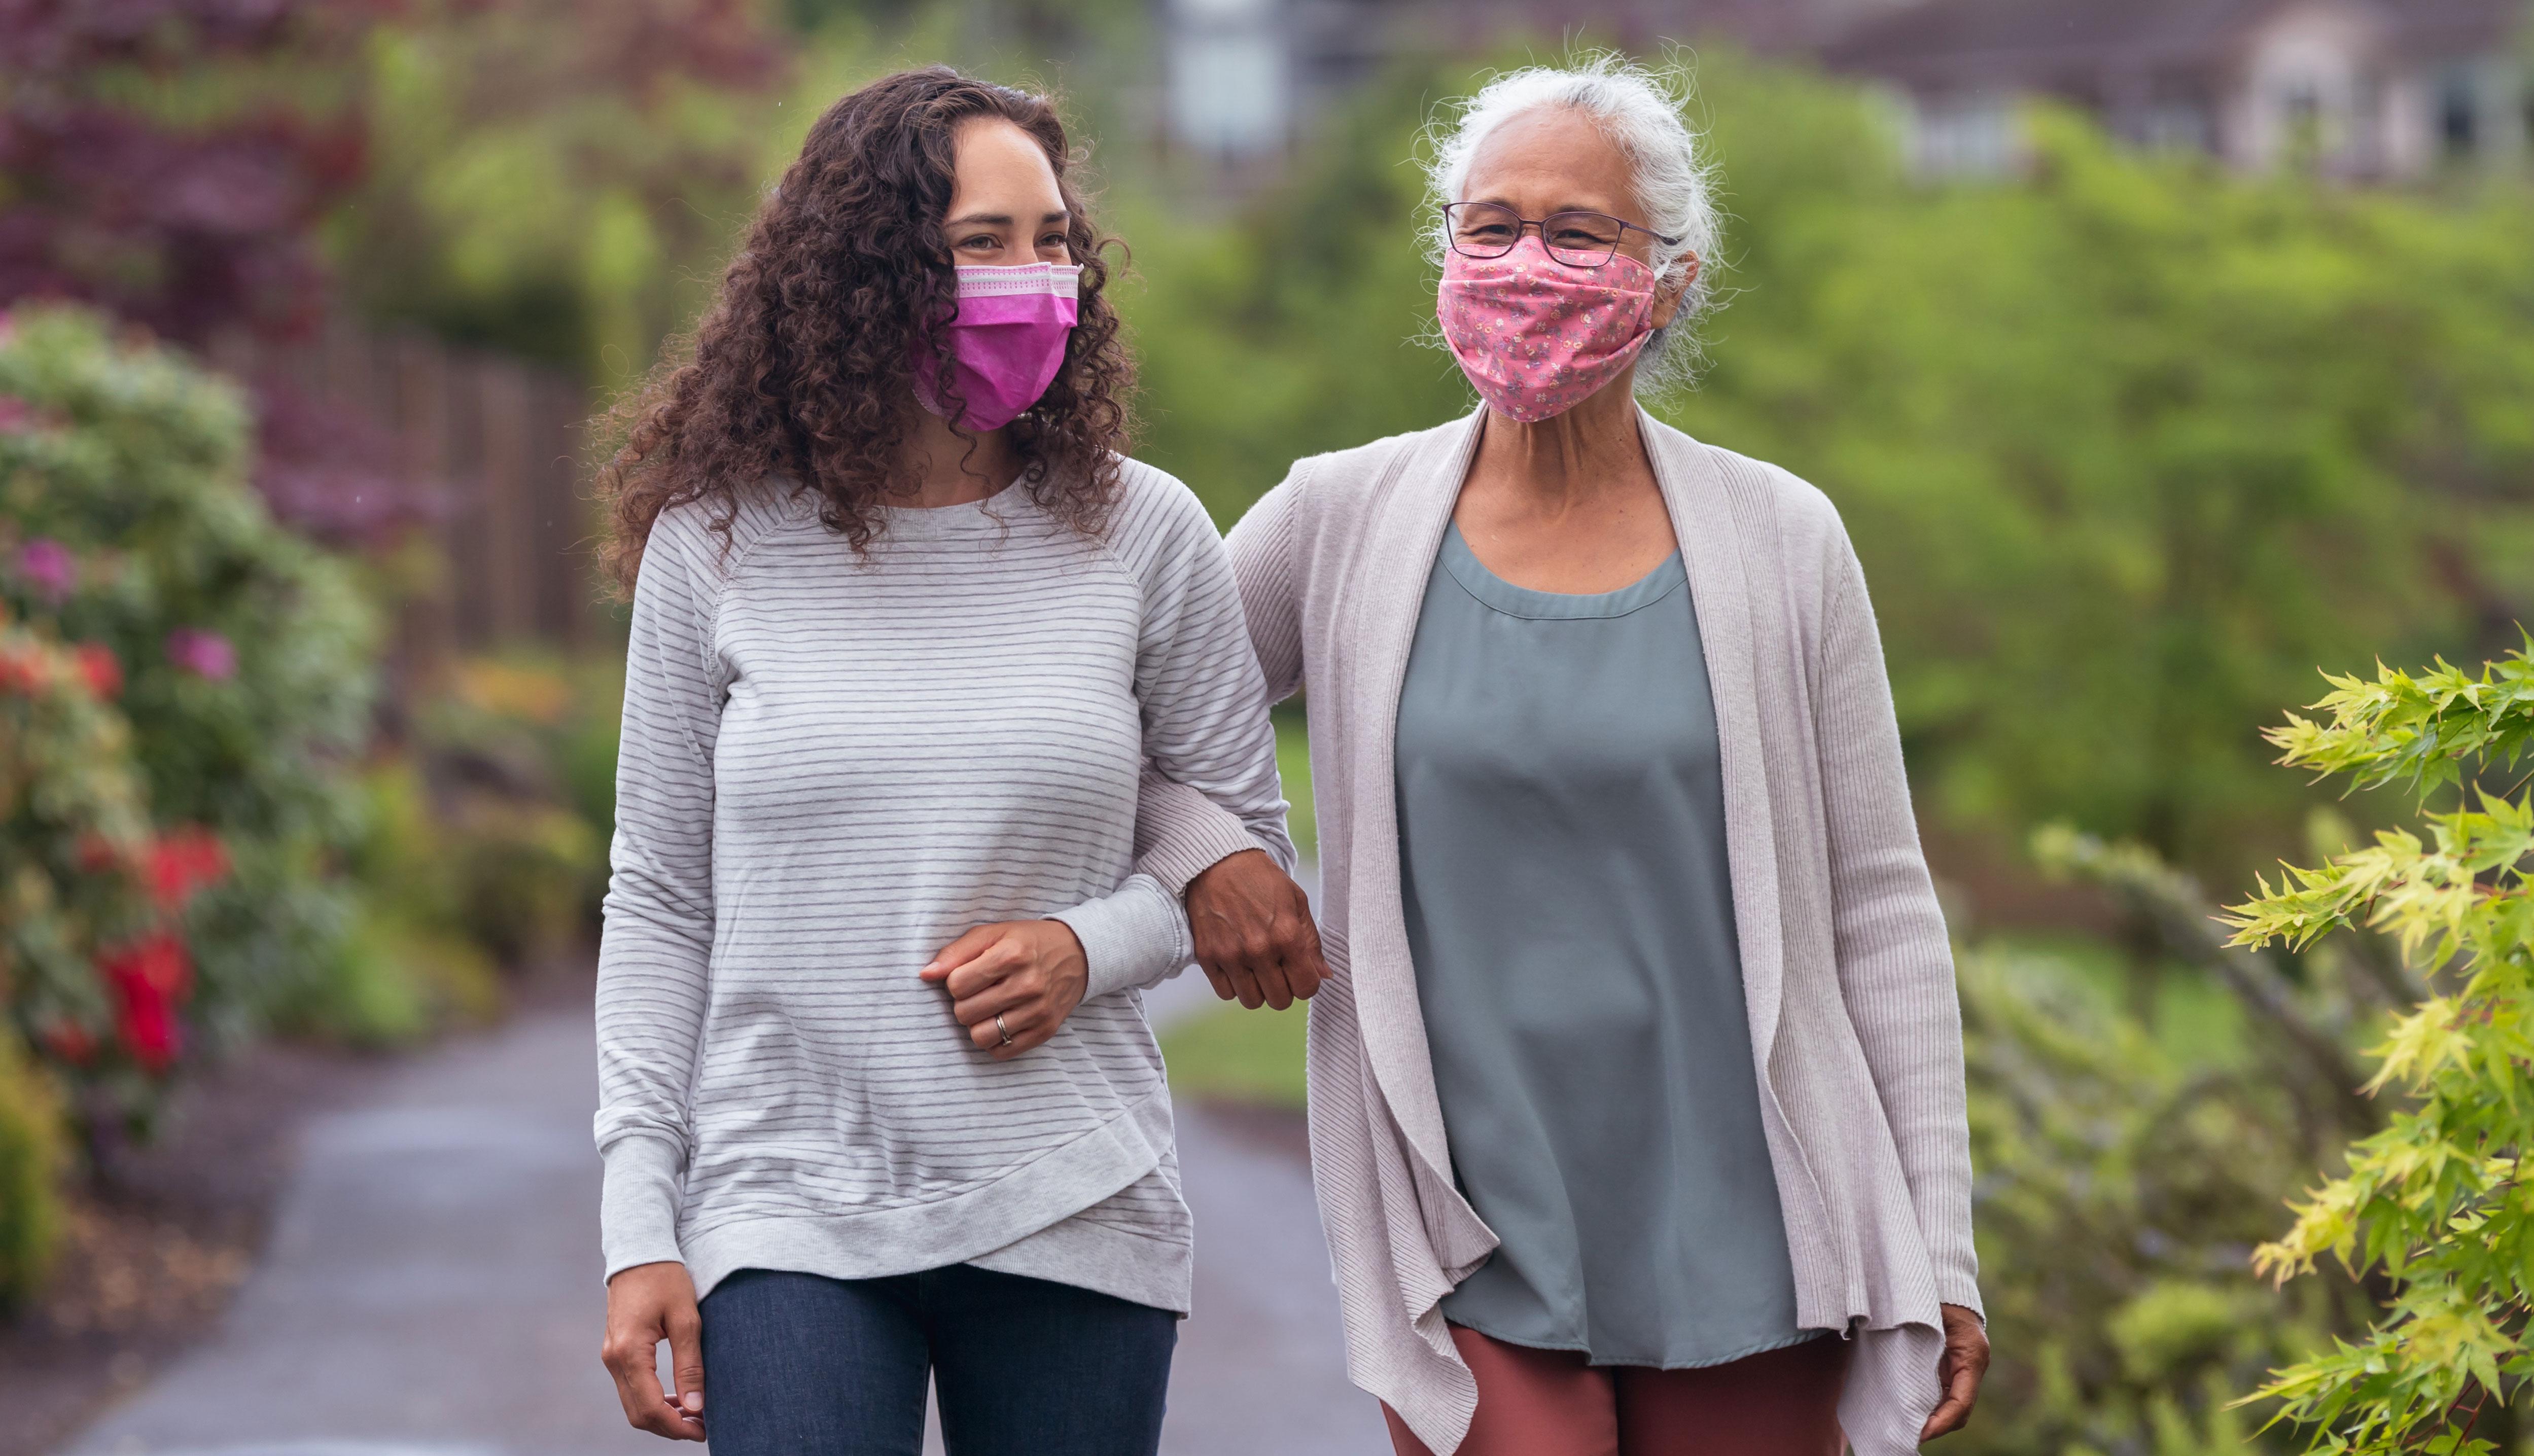 Dos mujeres, usando mascarillas, caminan al aire libre